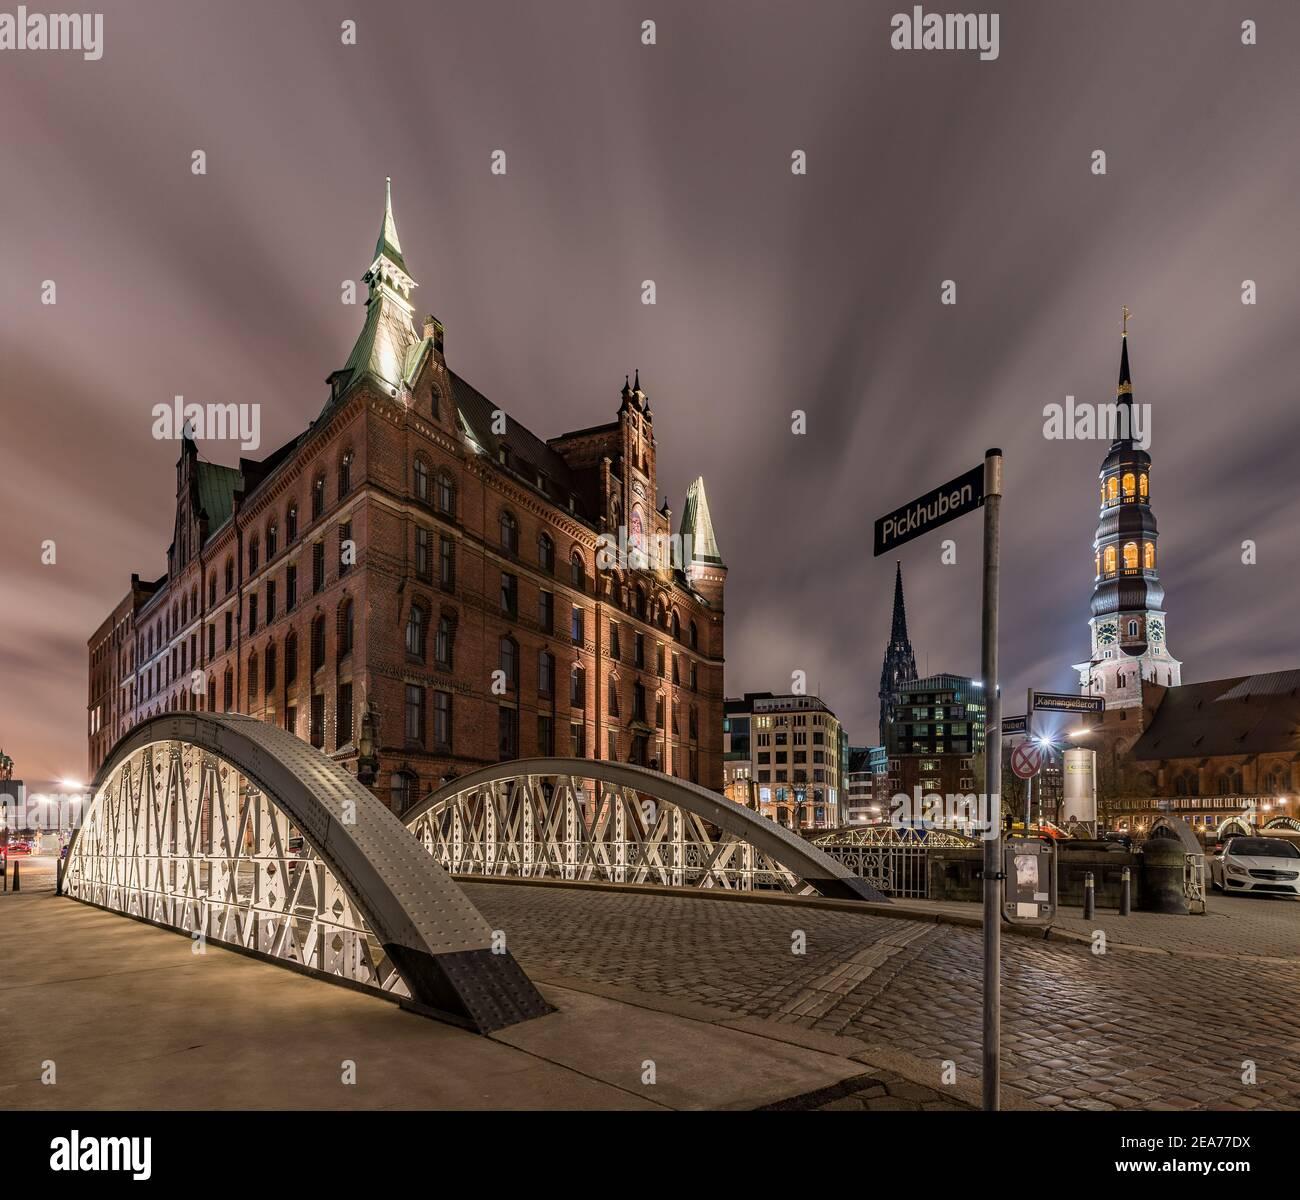 Hamburg Speicherstadt Pickhuben with Sandthorquaihof and church St. Katharinen at night Stock Photo